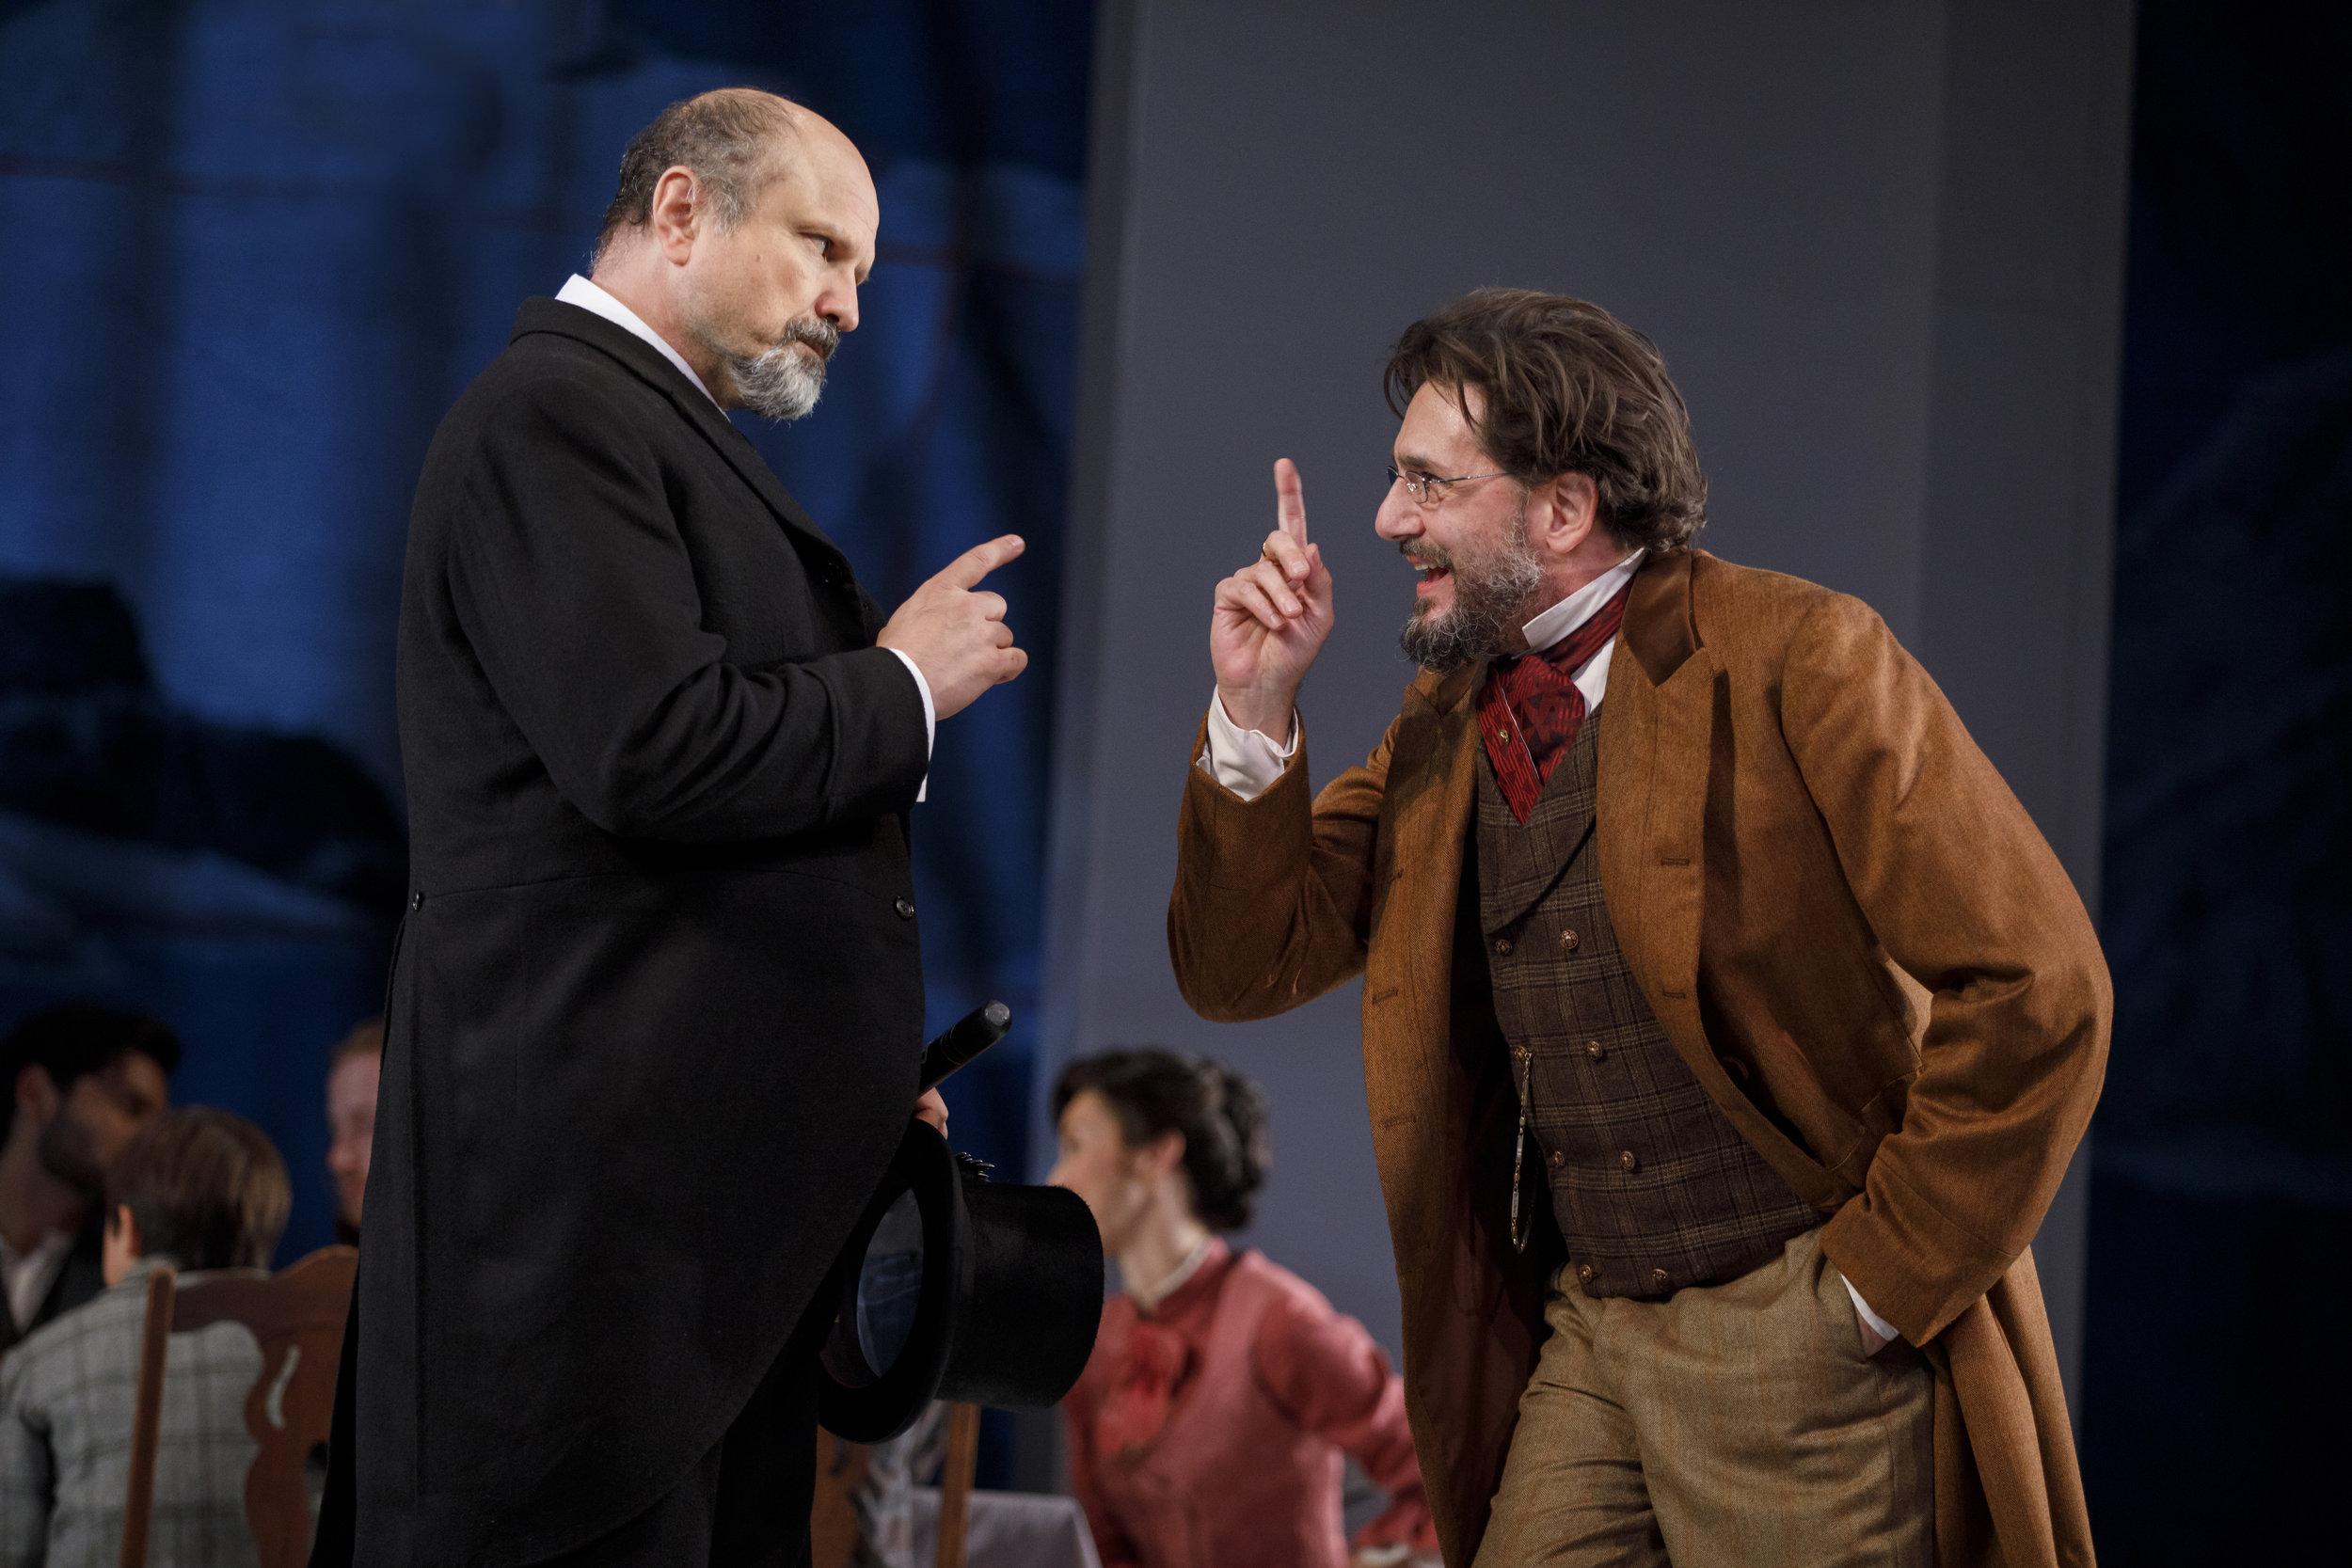 Mayor Peter Stockmann (Enrico Colantoni), Dr. Thomas Stockmann (Reg Rogers)